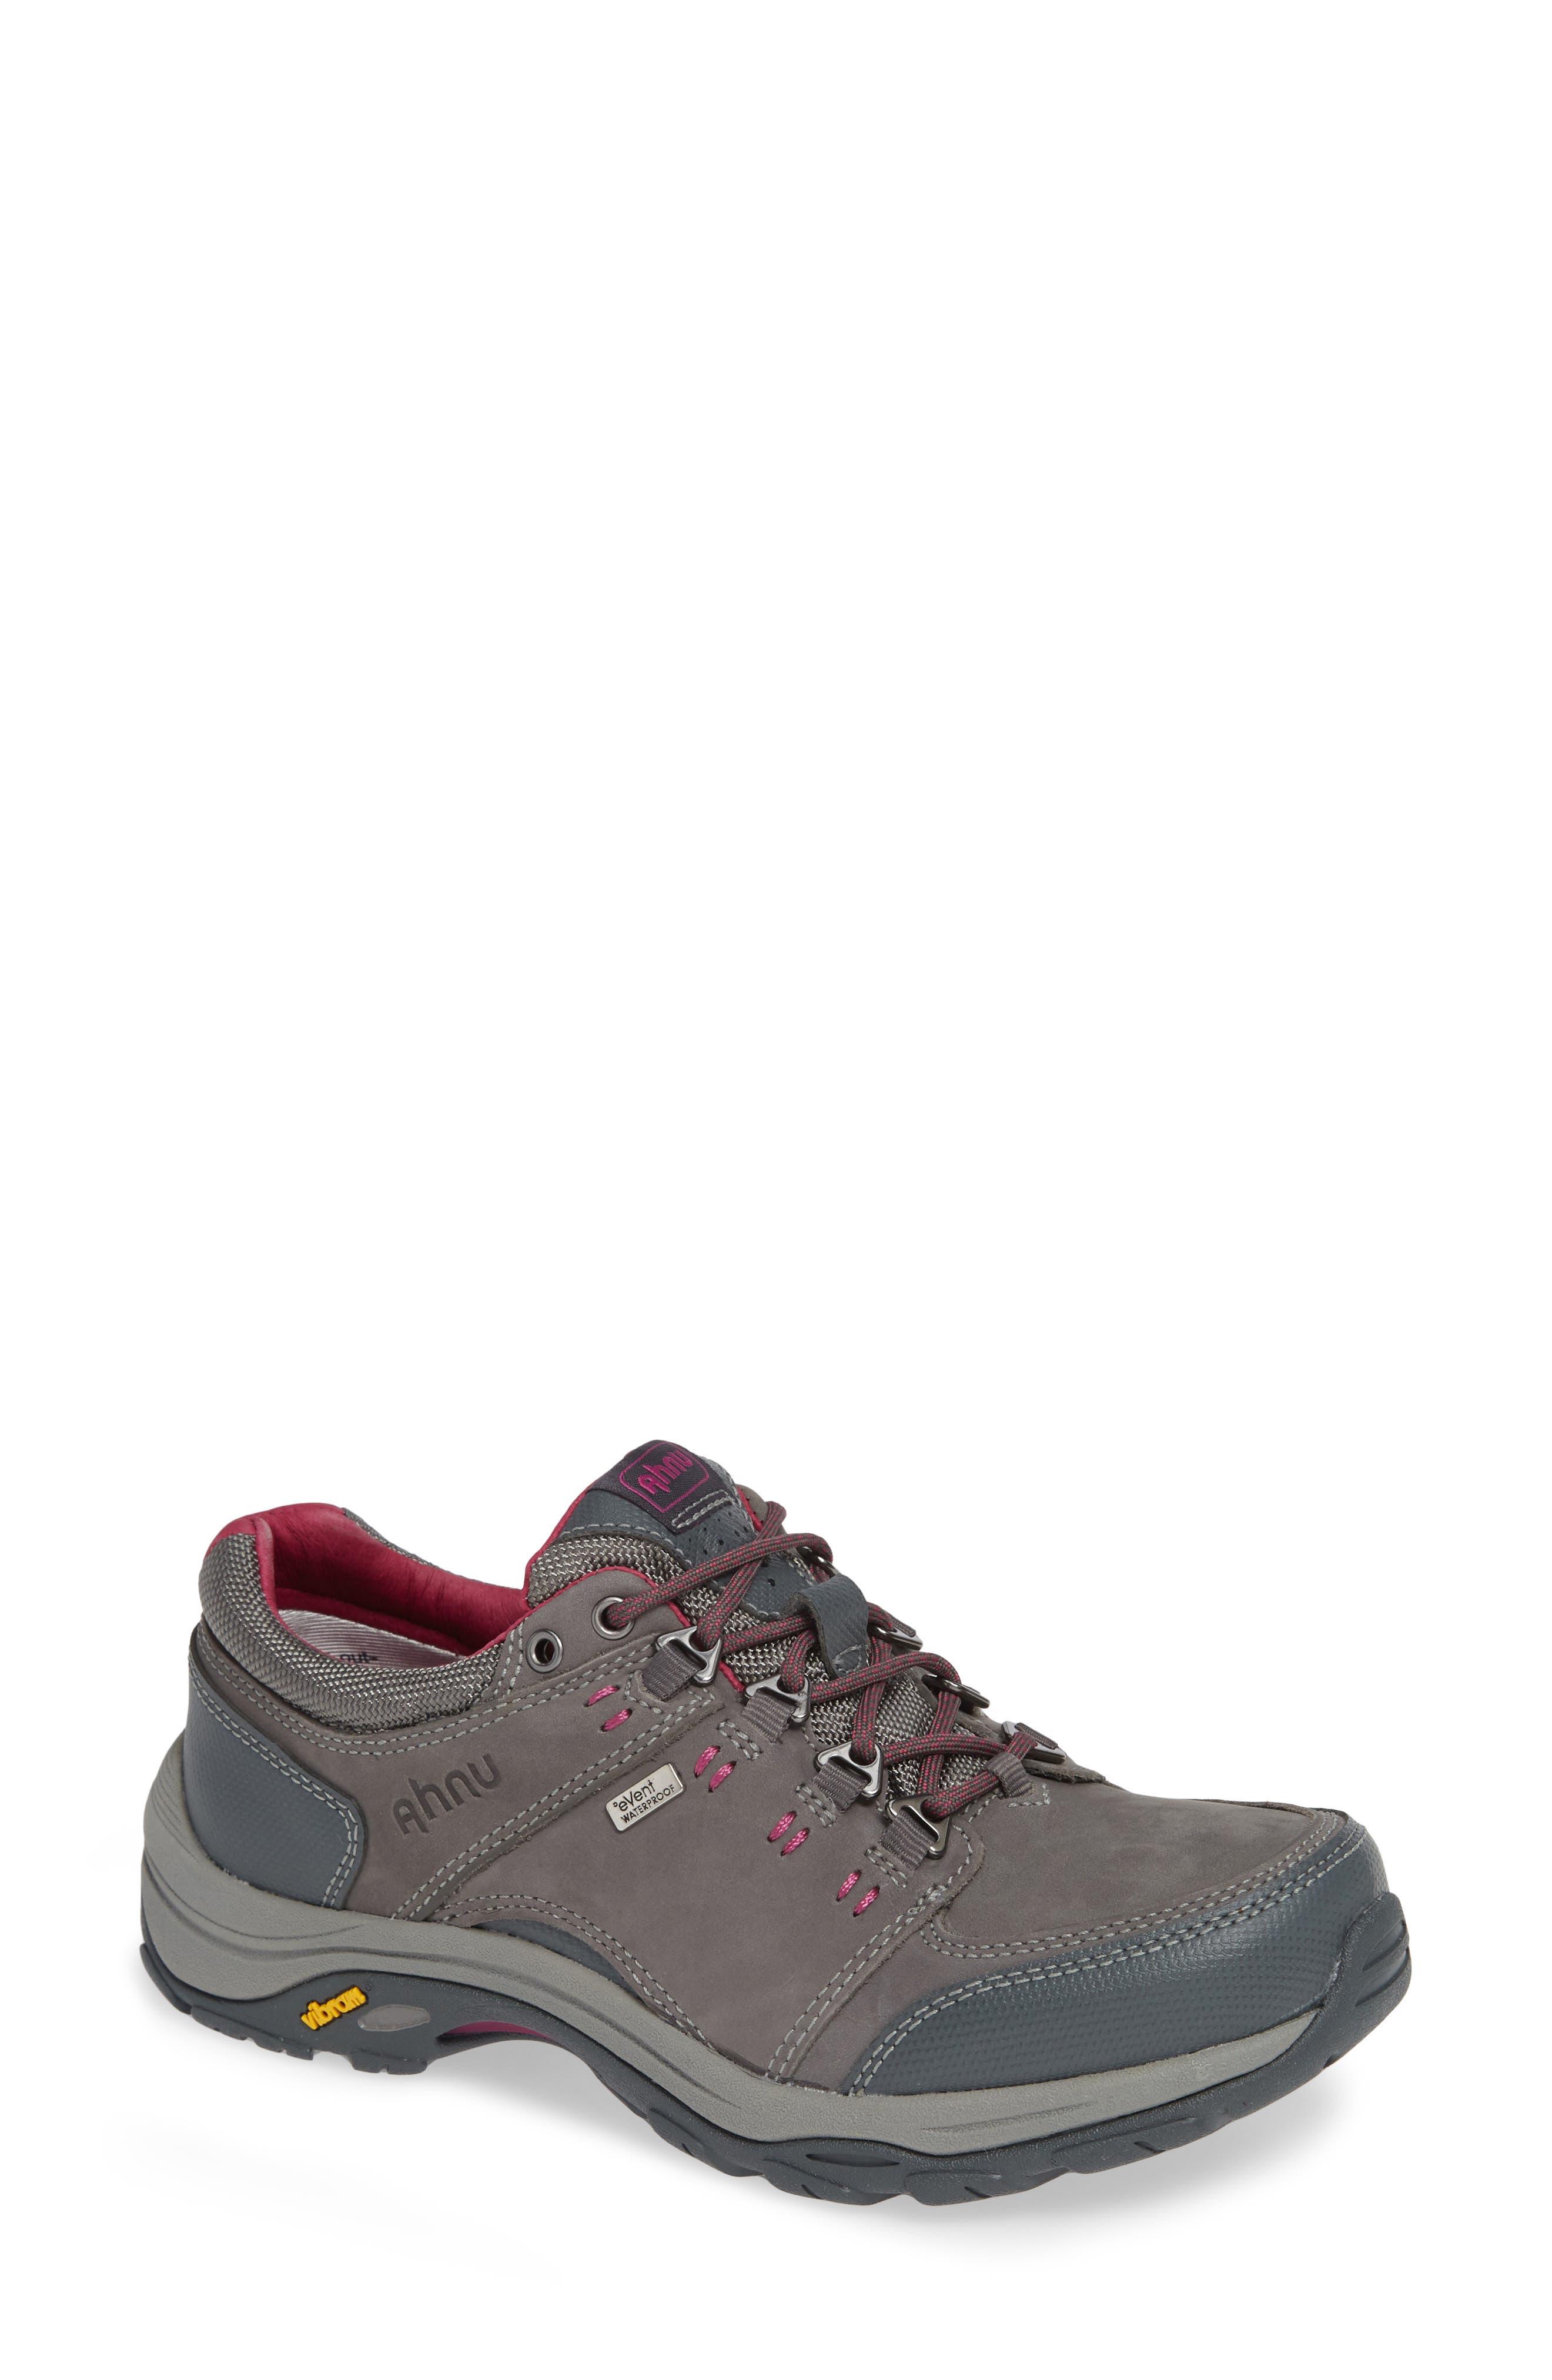 7a0b6b5a8 Ahnu By Teva Montara Iii Waterproof Hiking Sneaker